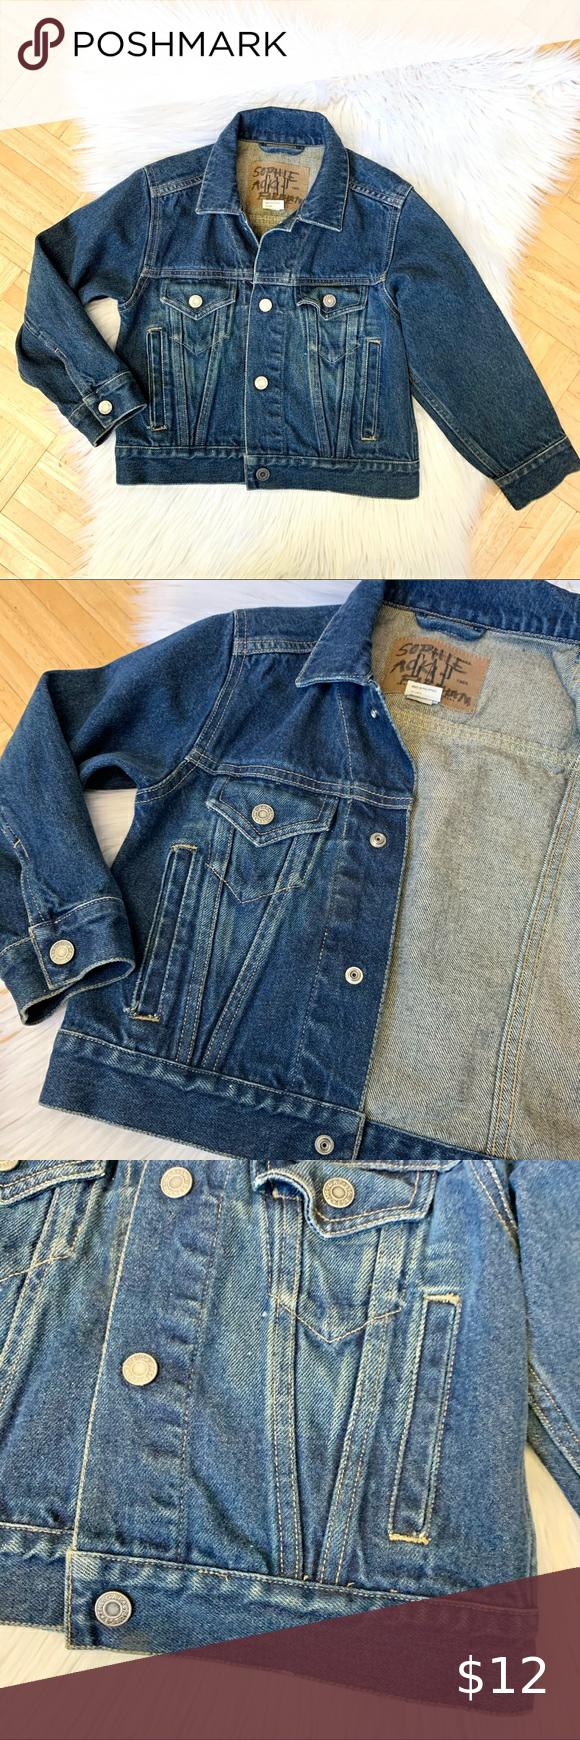 Vintage Gap Kids Jean Jacket Kids Jeans Jacket Baby Denim Jacket Jeans Kids [ 1740 x 580 Pixel ]